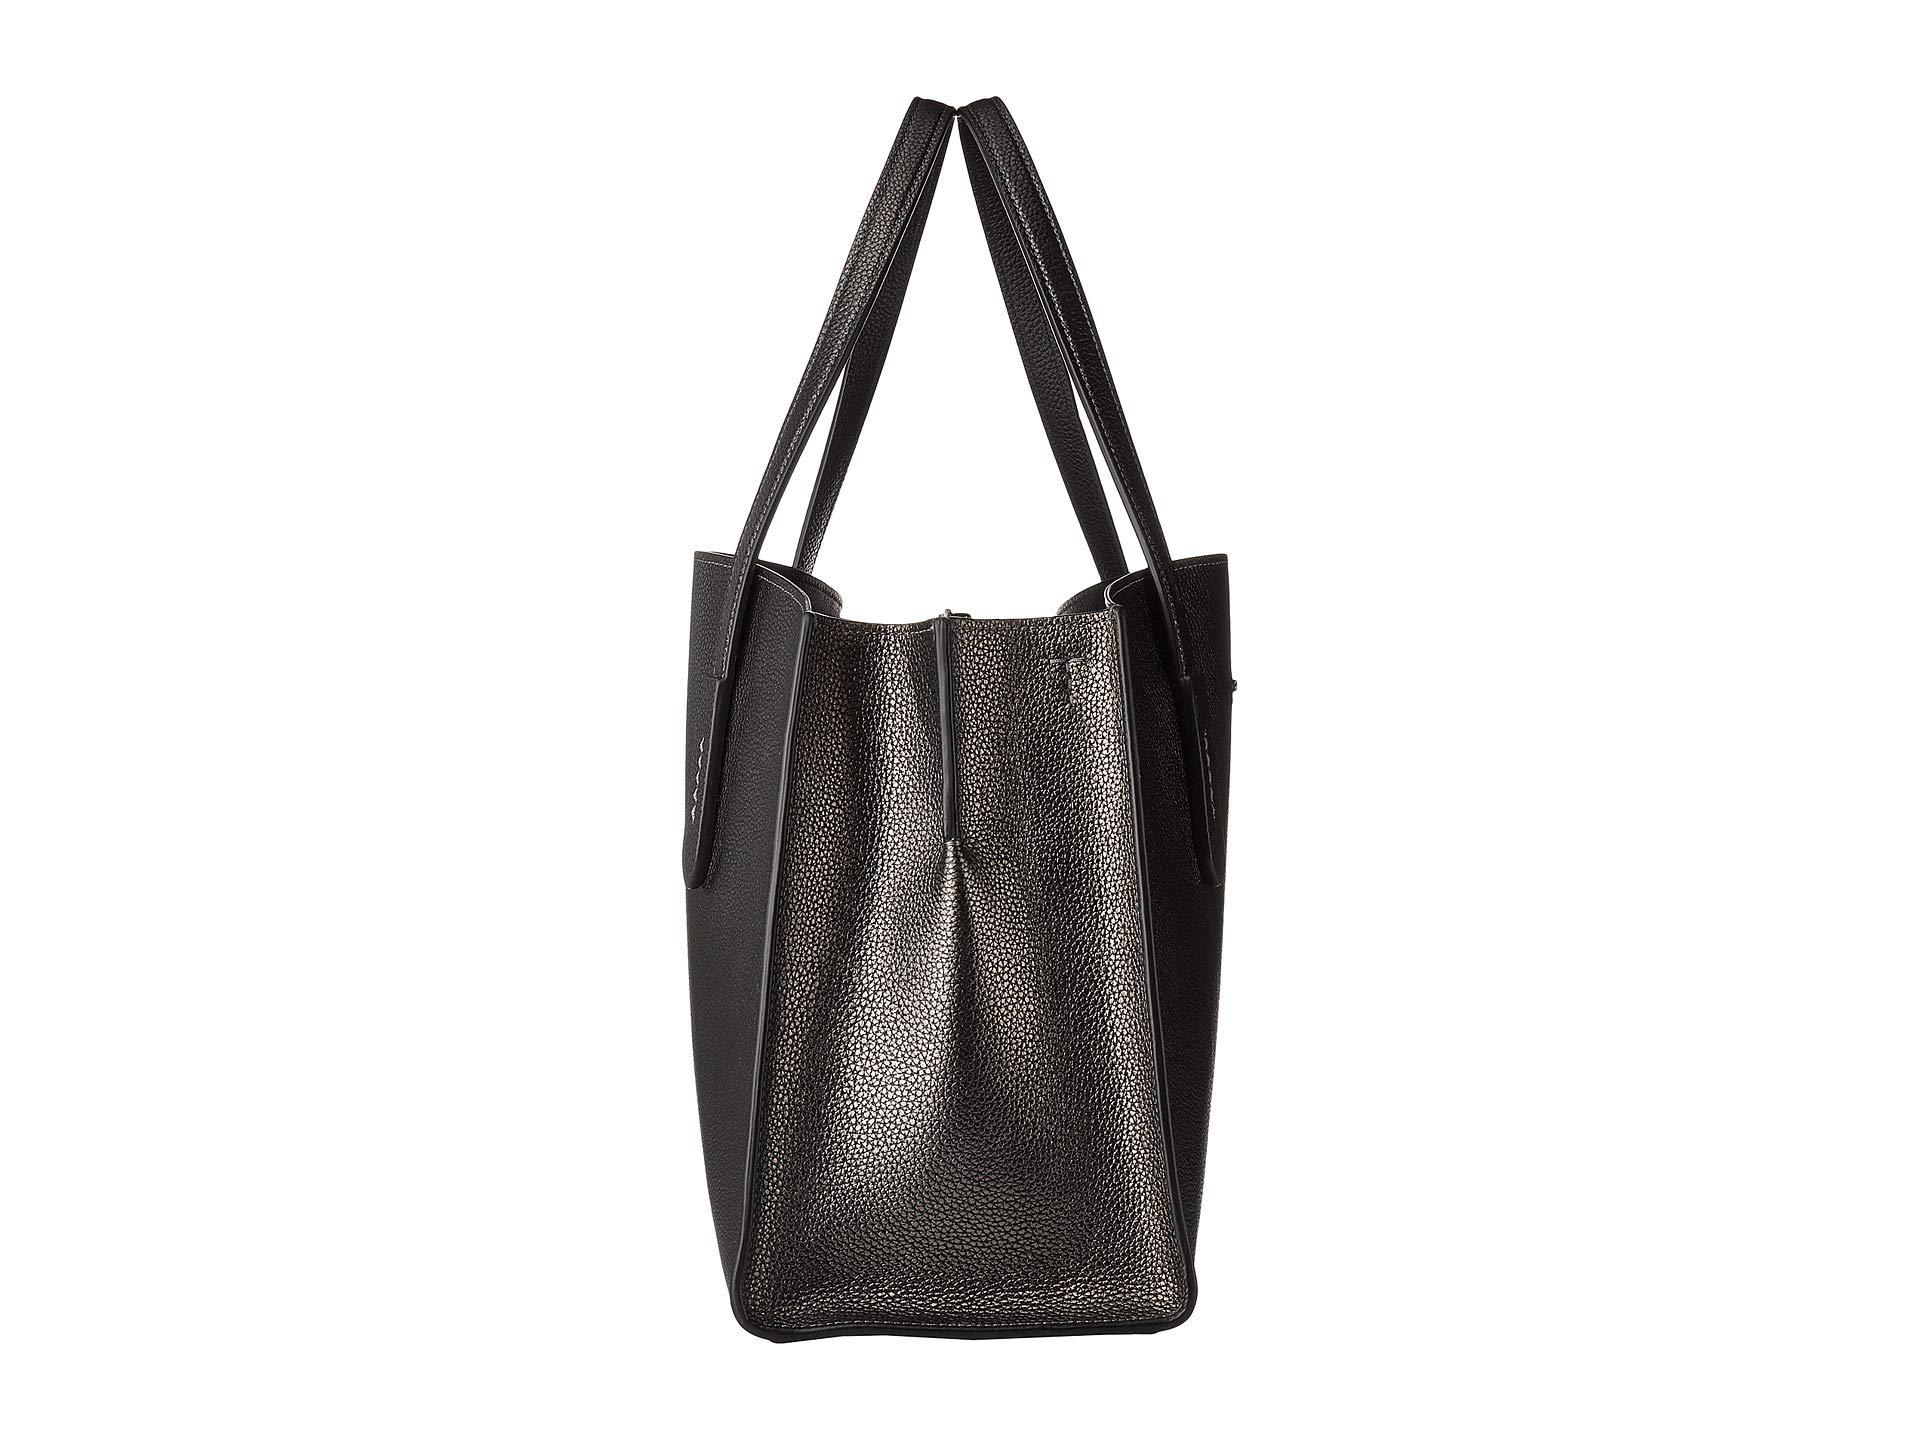 498a5f79cc Lyst - COACH Metallic Leather Charlie Carryall (gunmetal metallic ...